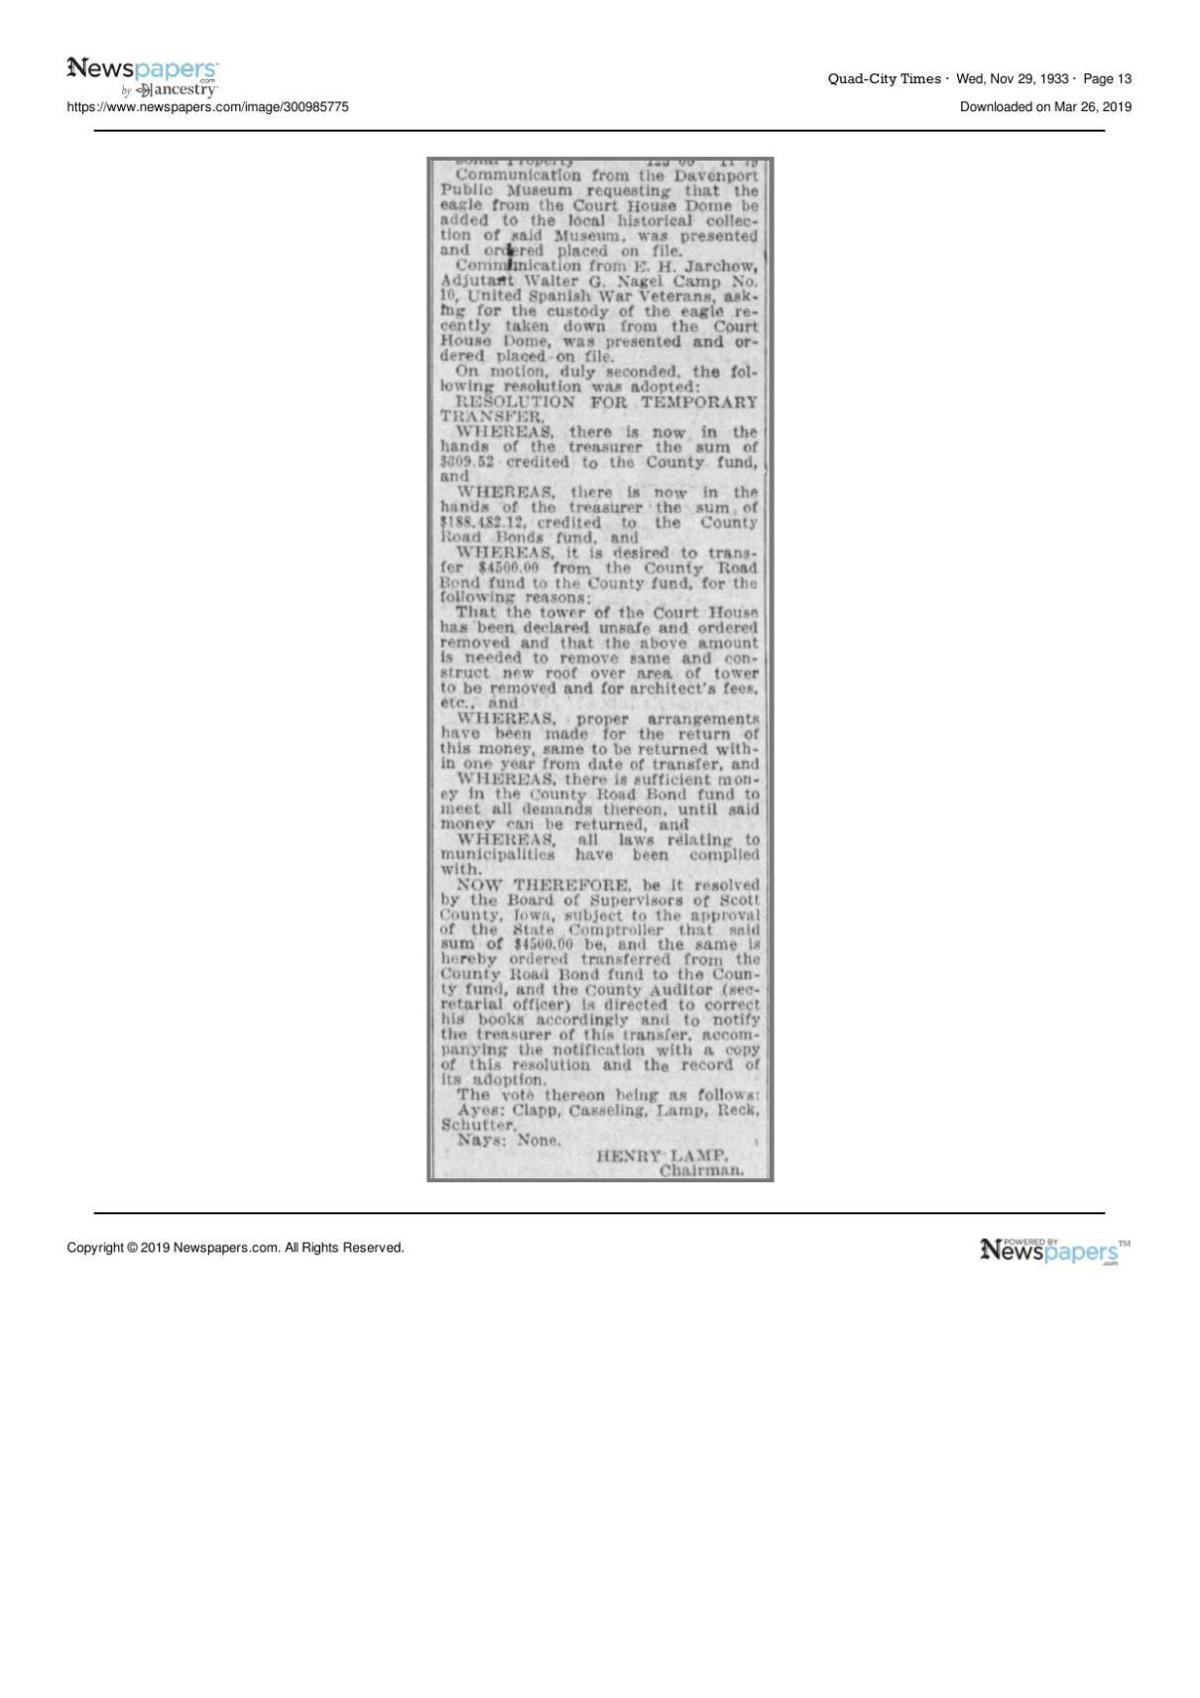 The Davenport Democrat and Leader -- Nov. 29, 1933 page 13